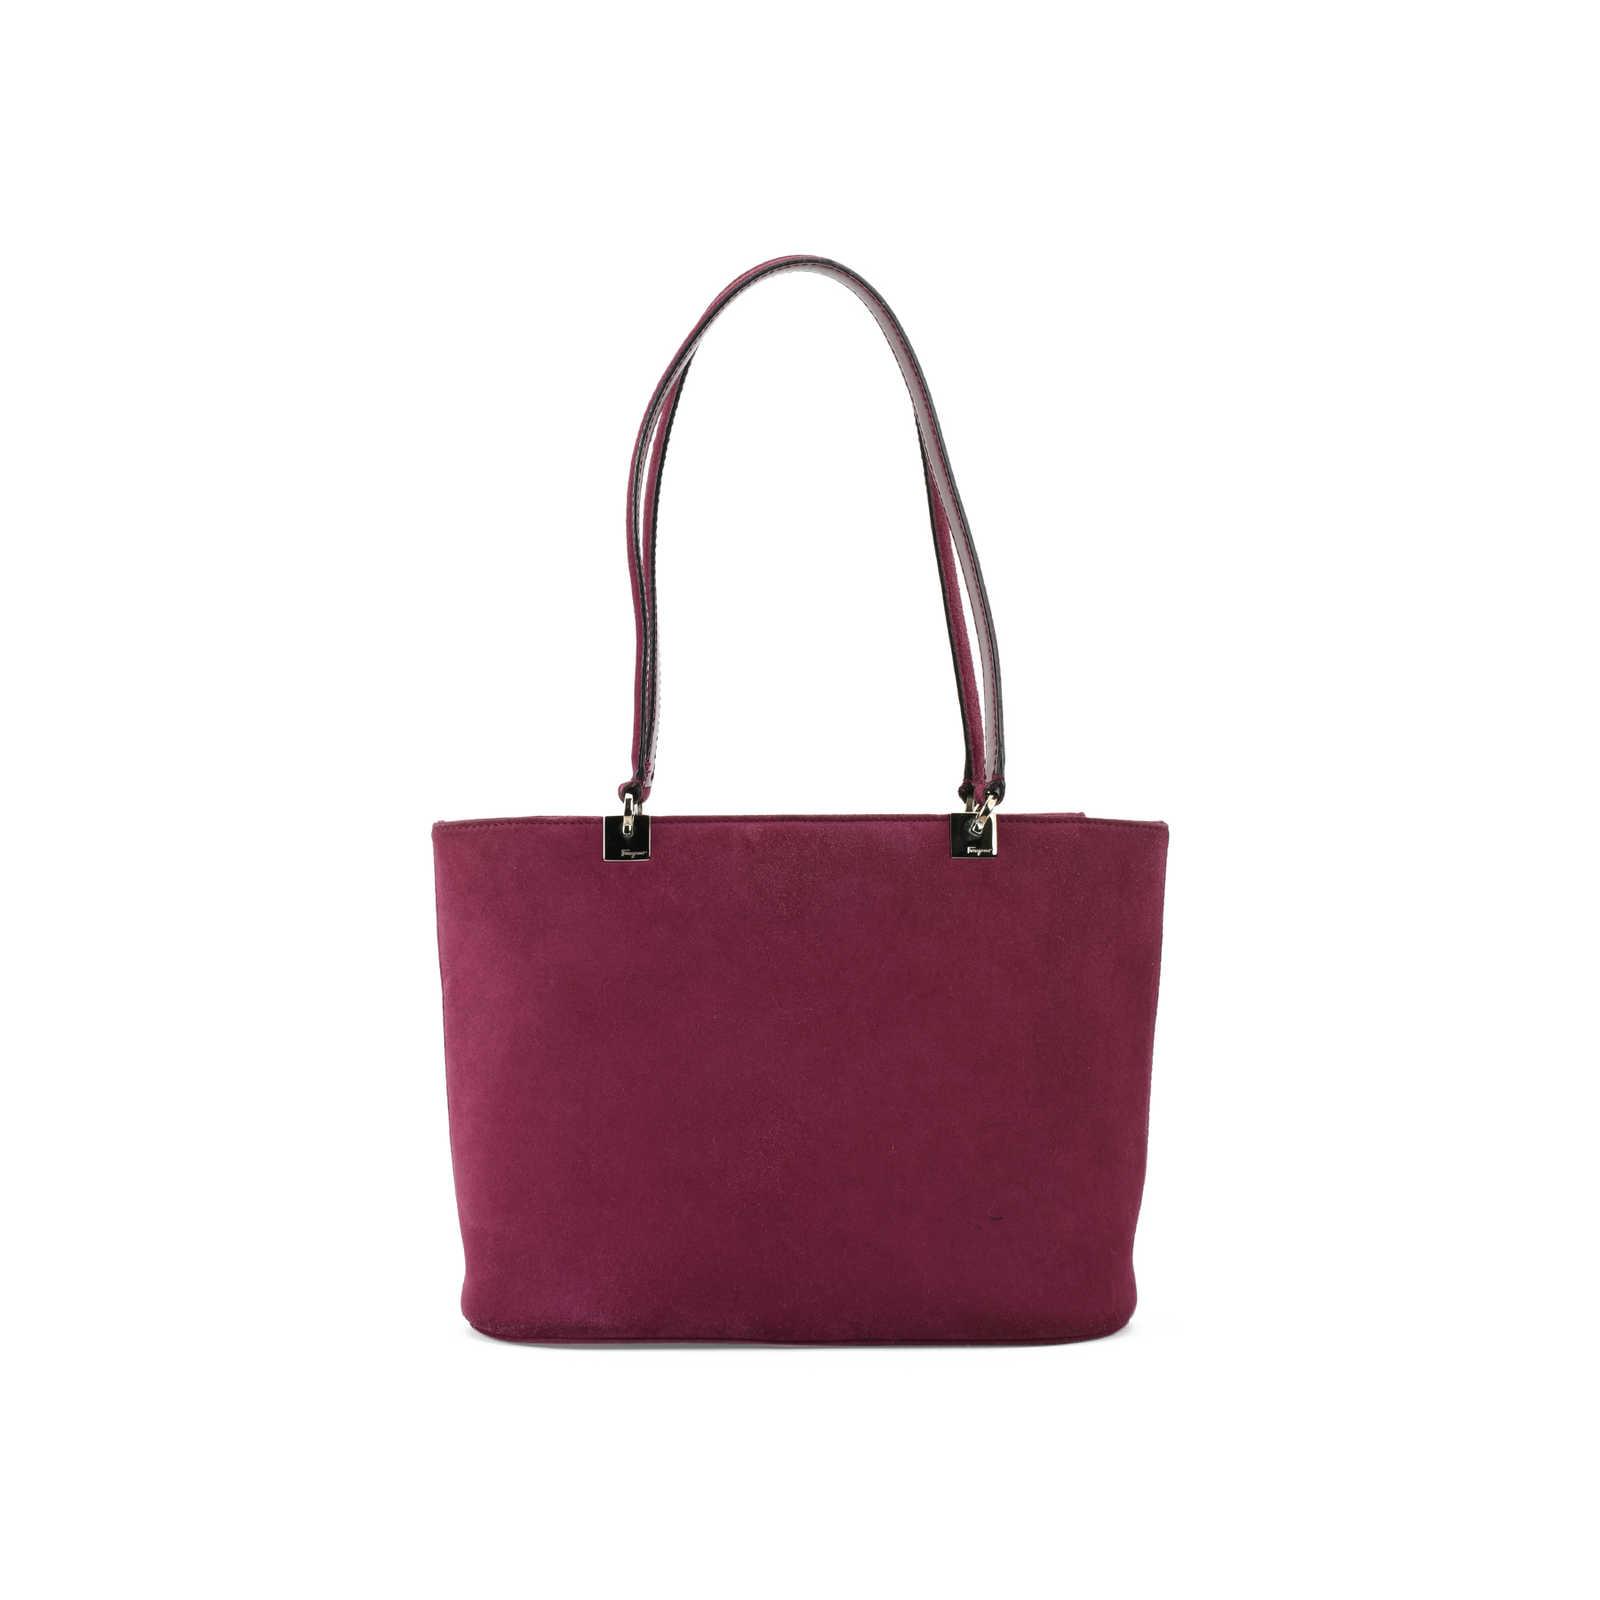 8d42d651f92 Authentic Second Hand Salvatore Ferragamo Suede Tote Handbag  (PSS-377-00050) ...